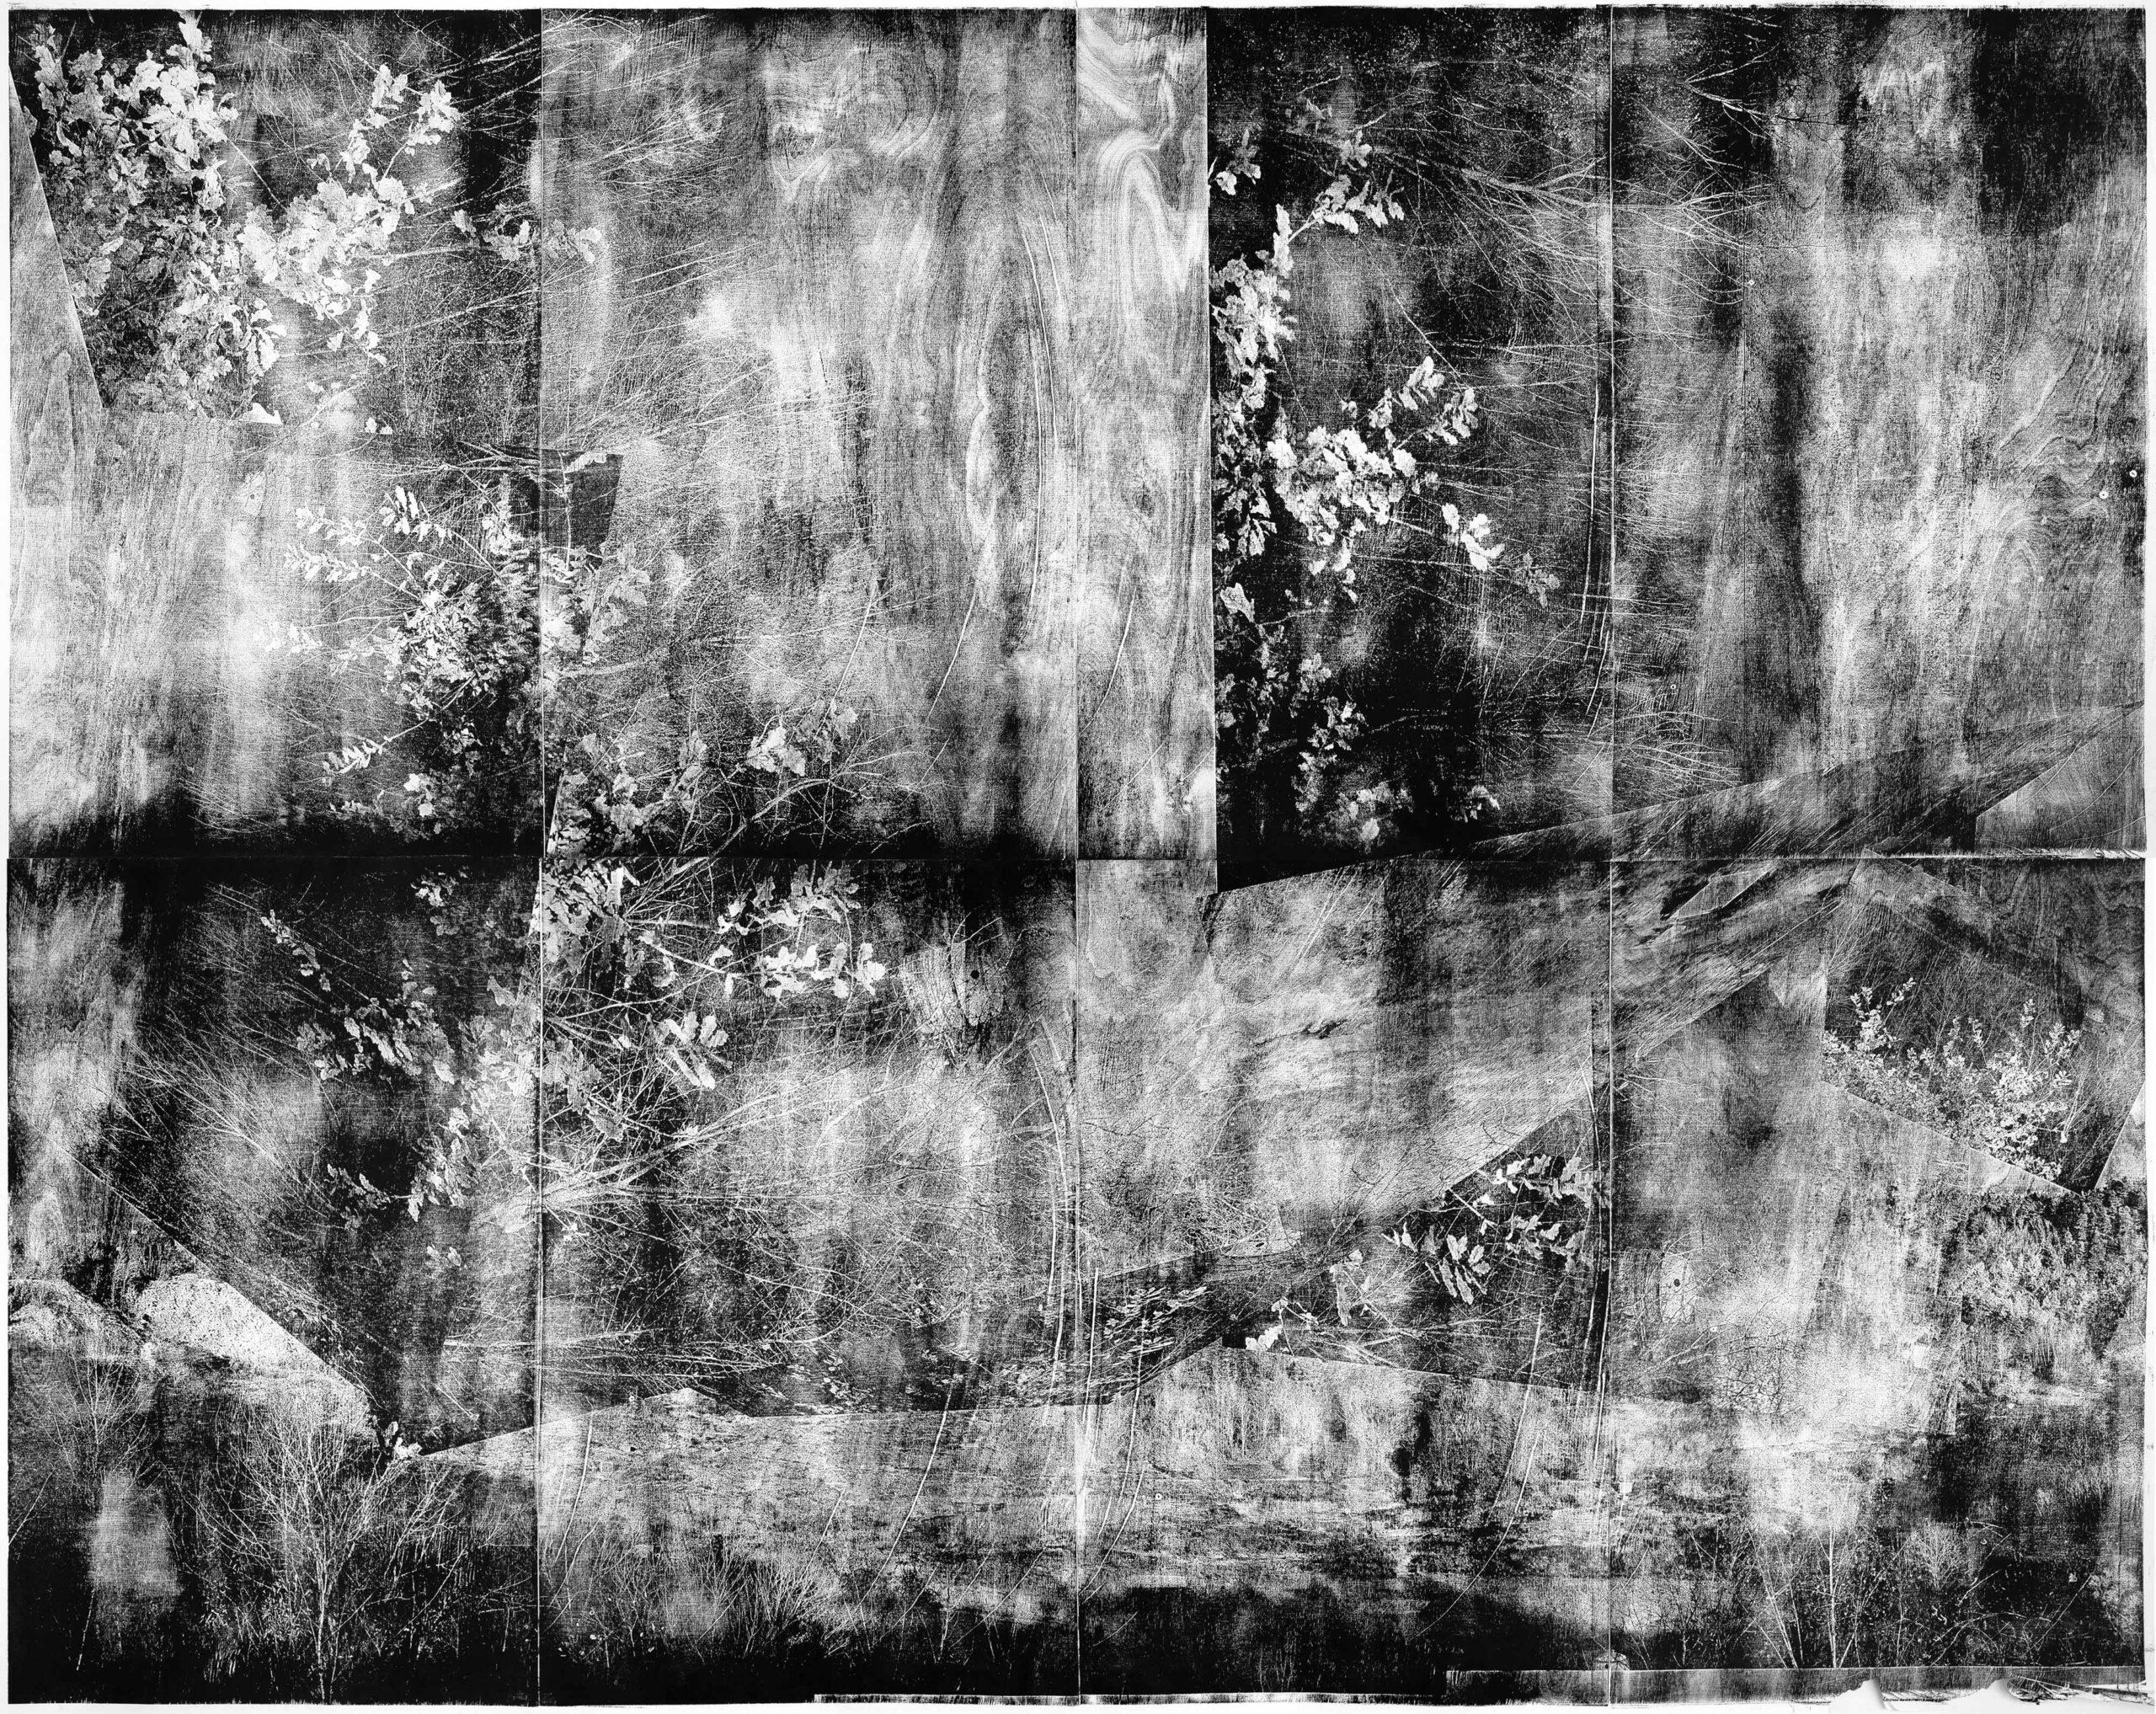 Messel 2, 2020, wood engraving, 200 x 251 cm